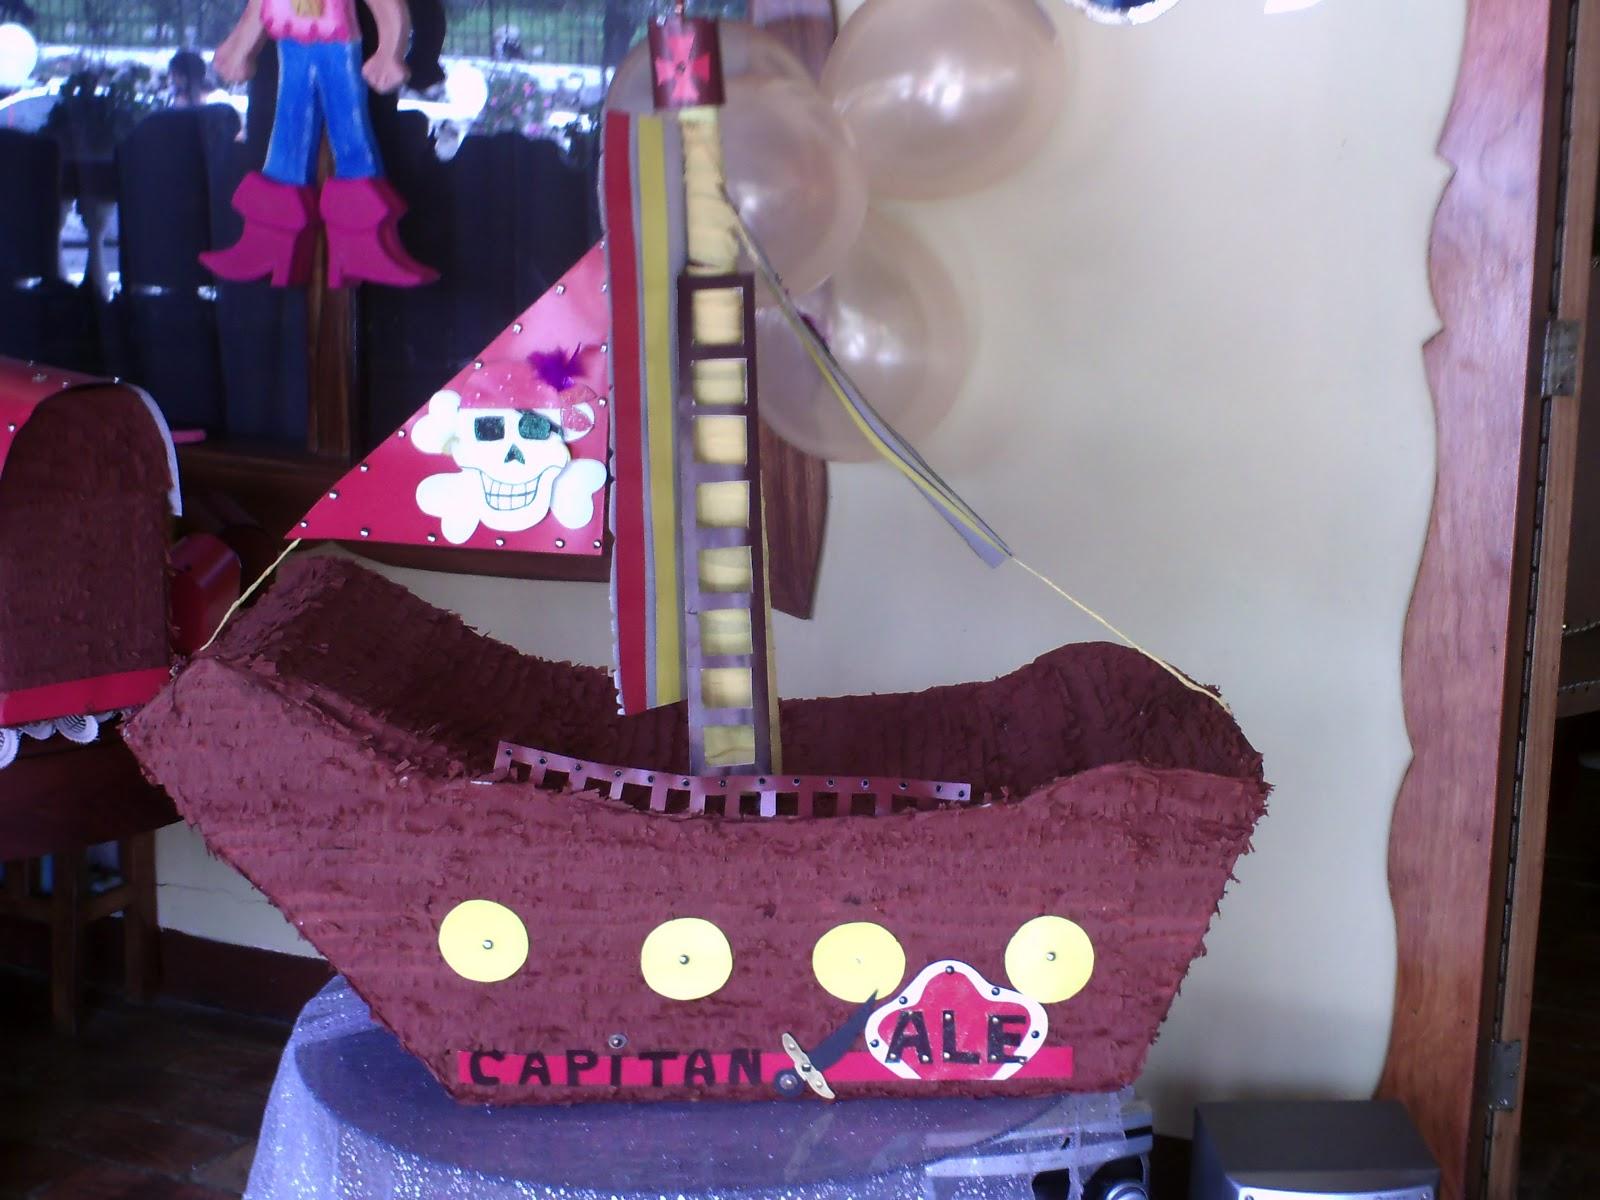 De Regalo Cofre Pirata De Ninos Decoracion Jake Chupetero Piratas